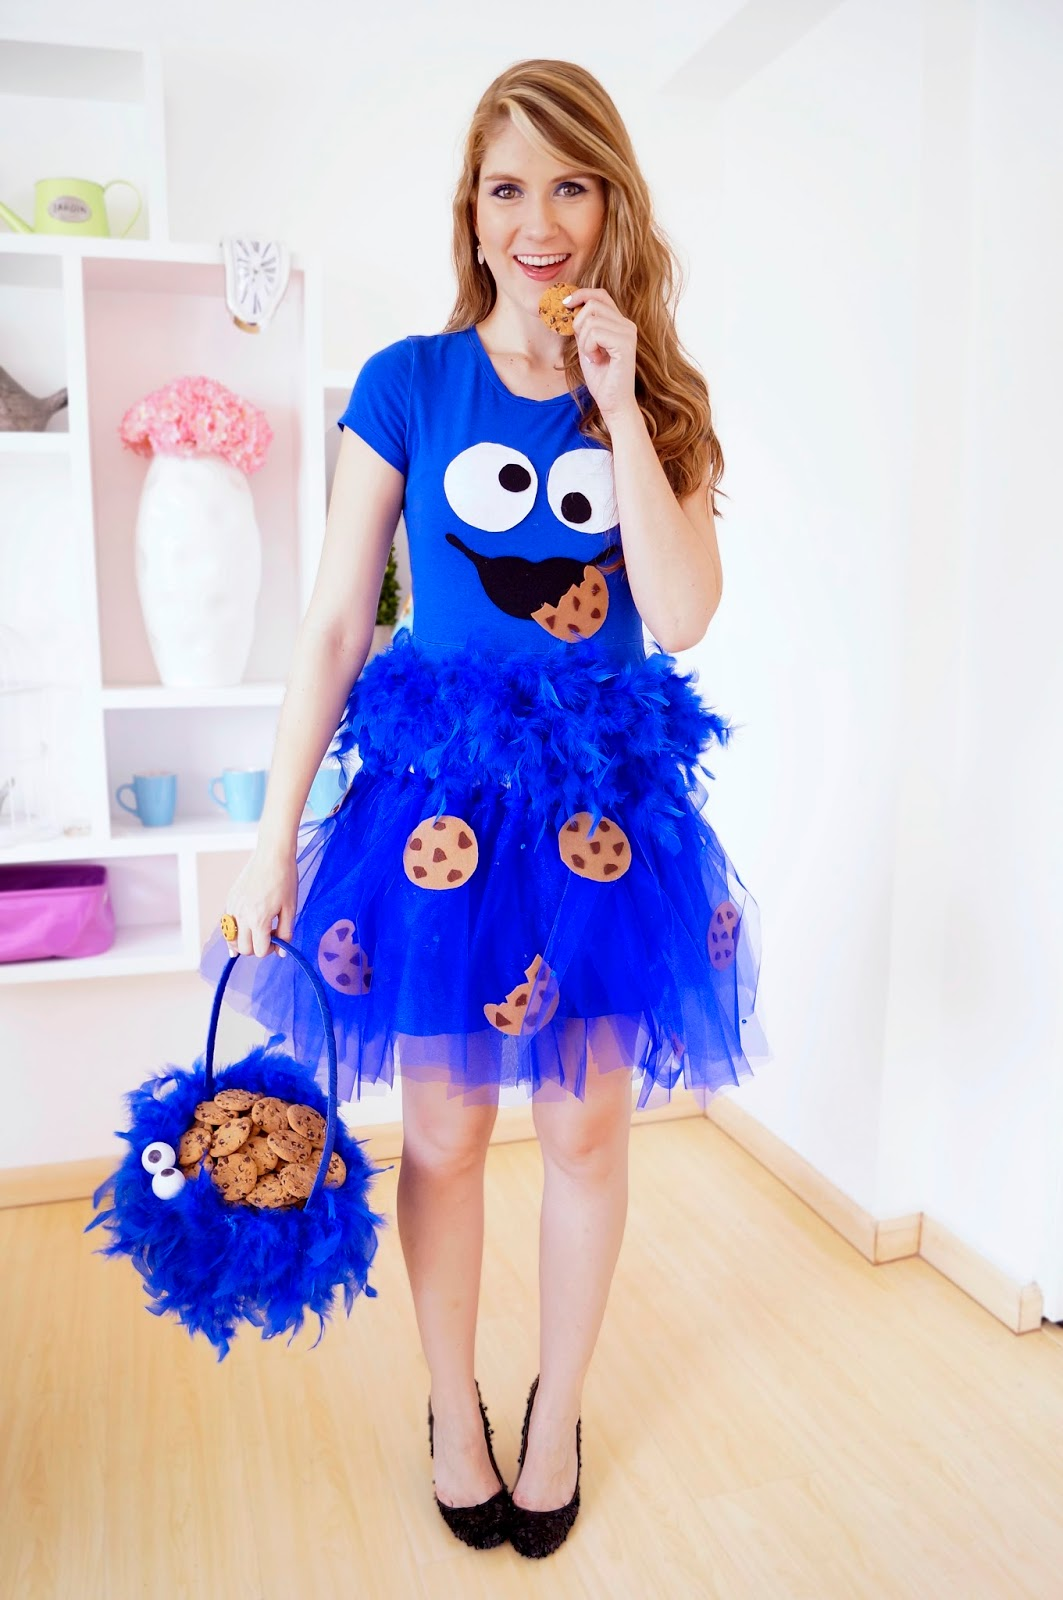 12 Cute Homemade Halloween costume for women. Cute Halloween Cookie Monster Costume for girls.  sc 1 st  Timeshood & 12 Pretty DIY Halloween Costume for Women - Timeshood